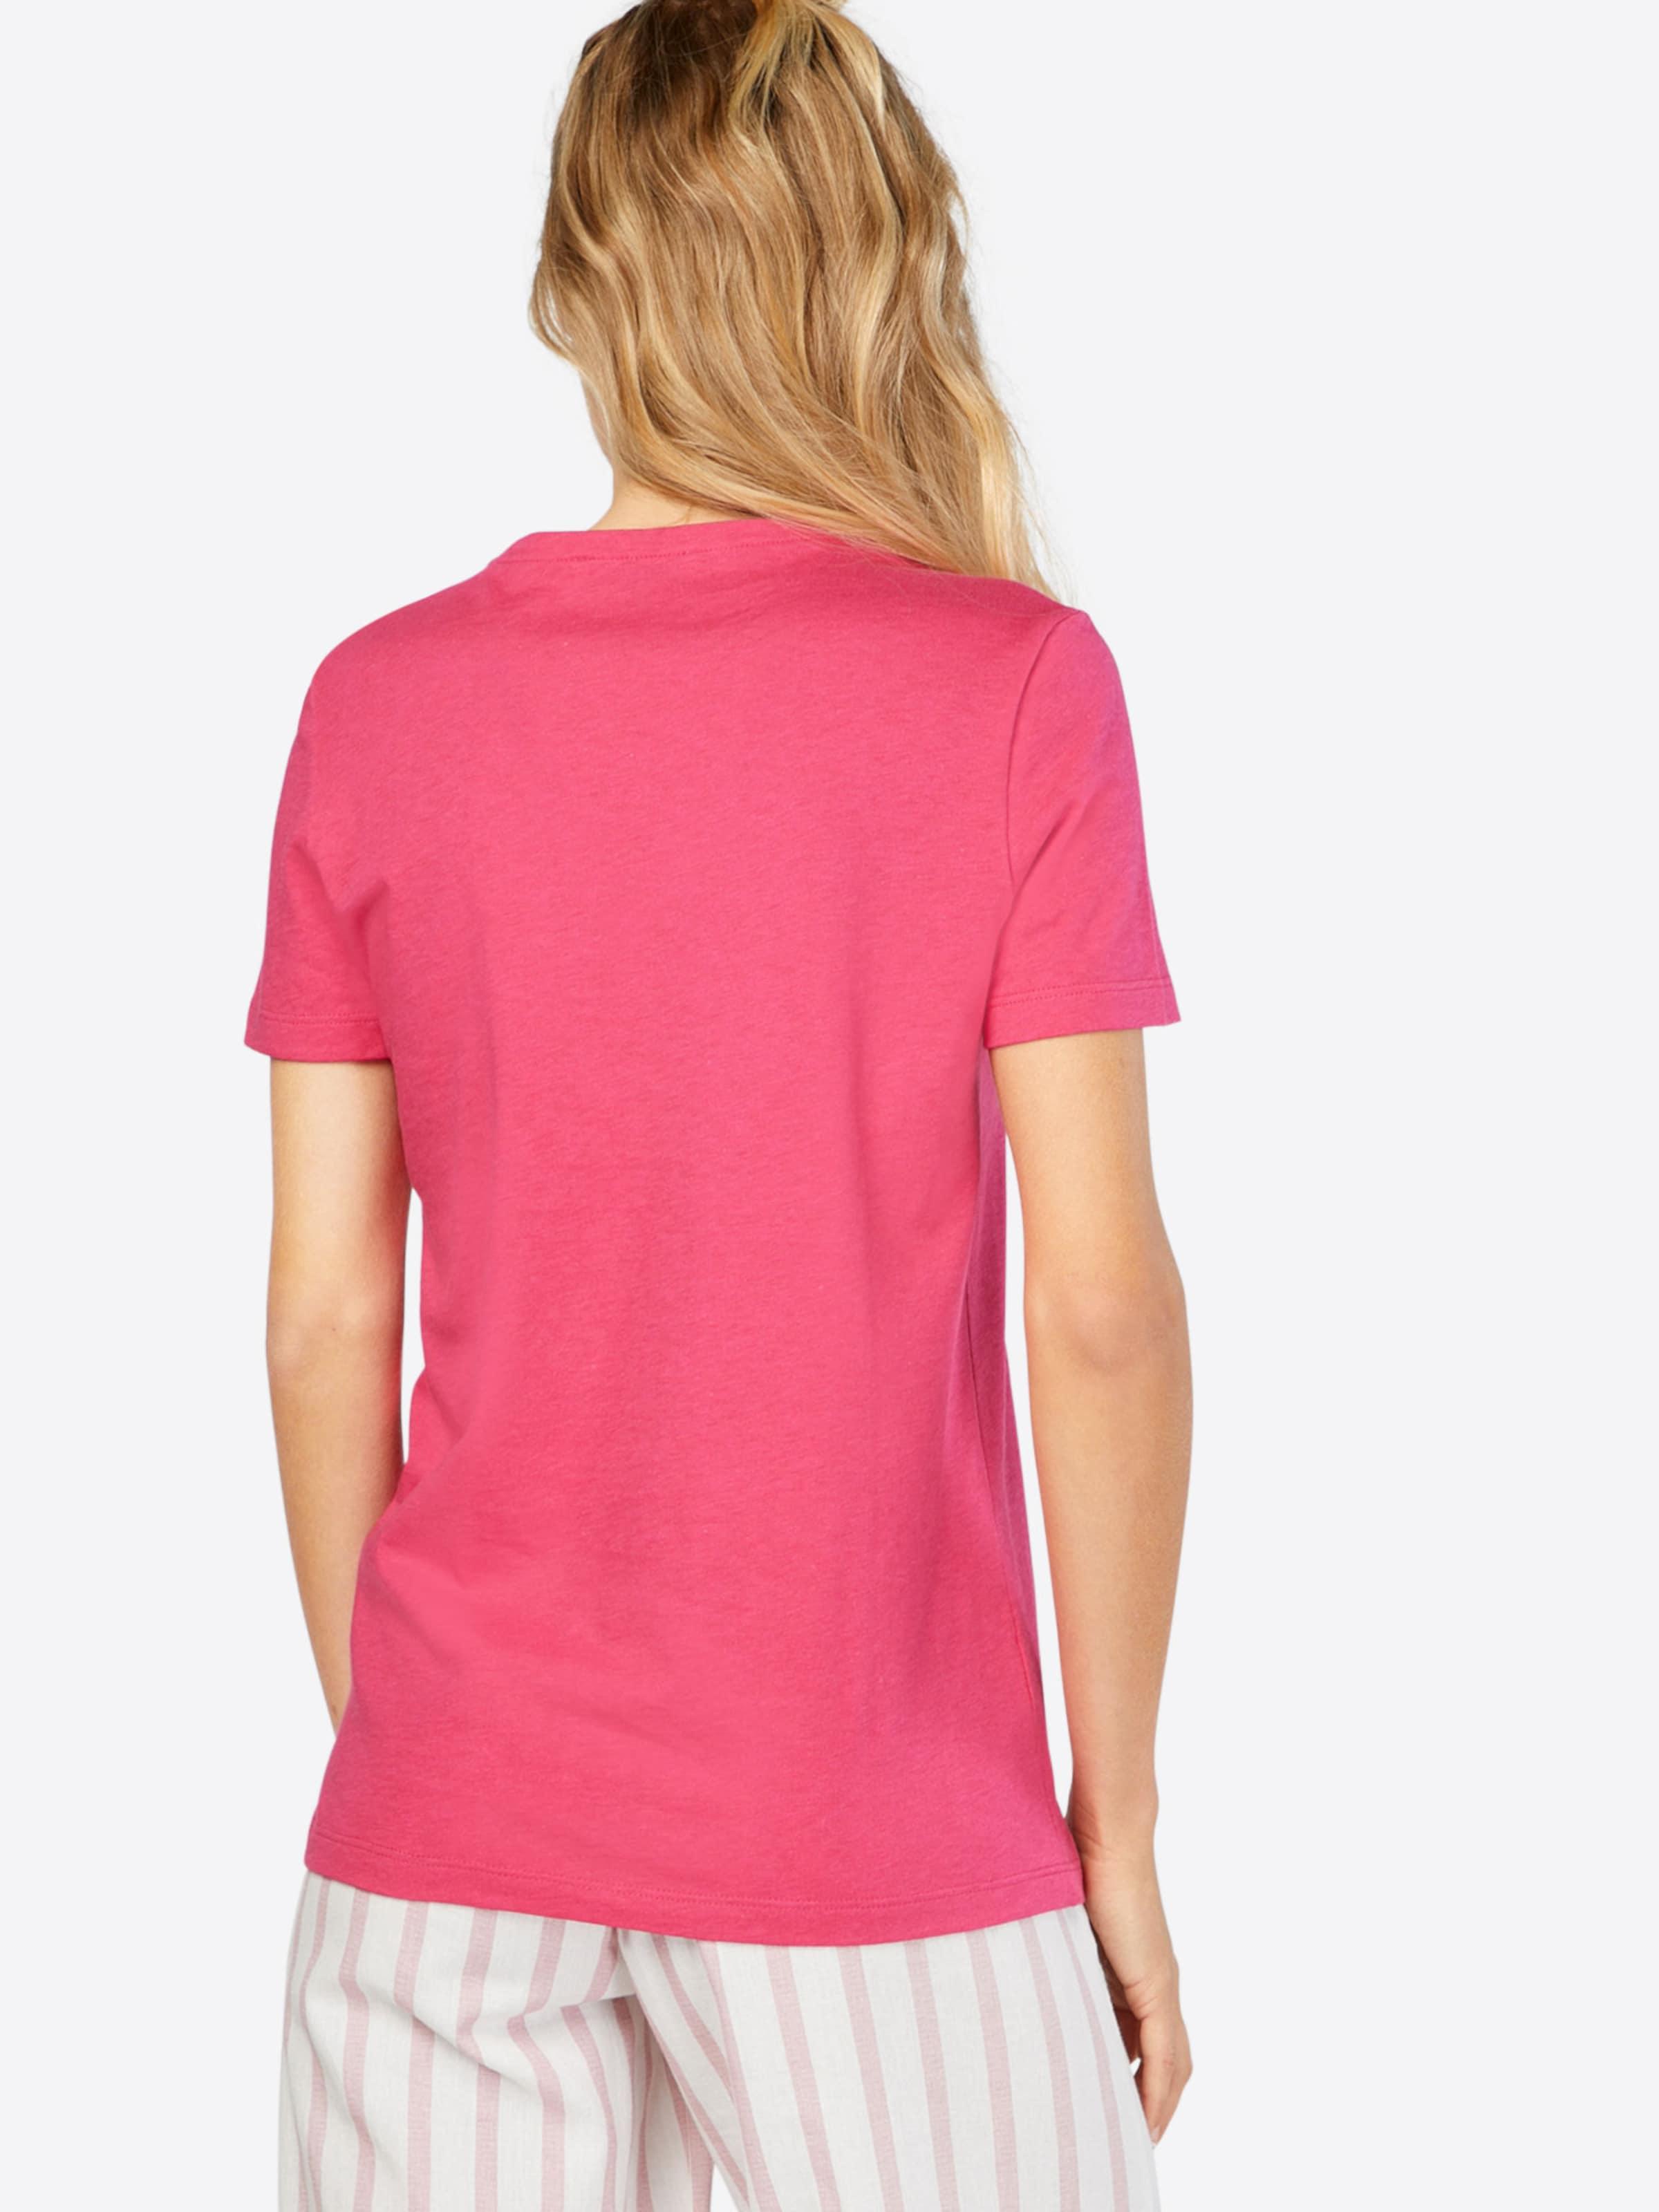 LACOSTE T-Shirt mit Label-Applikation Modestil qKhrffU